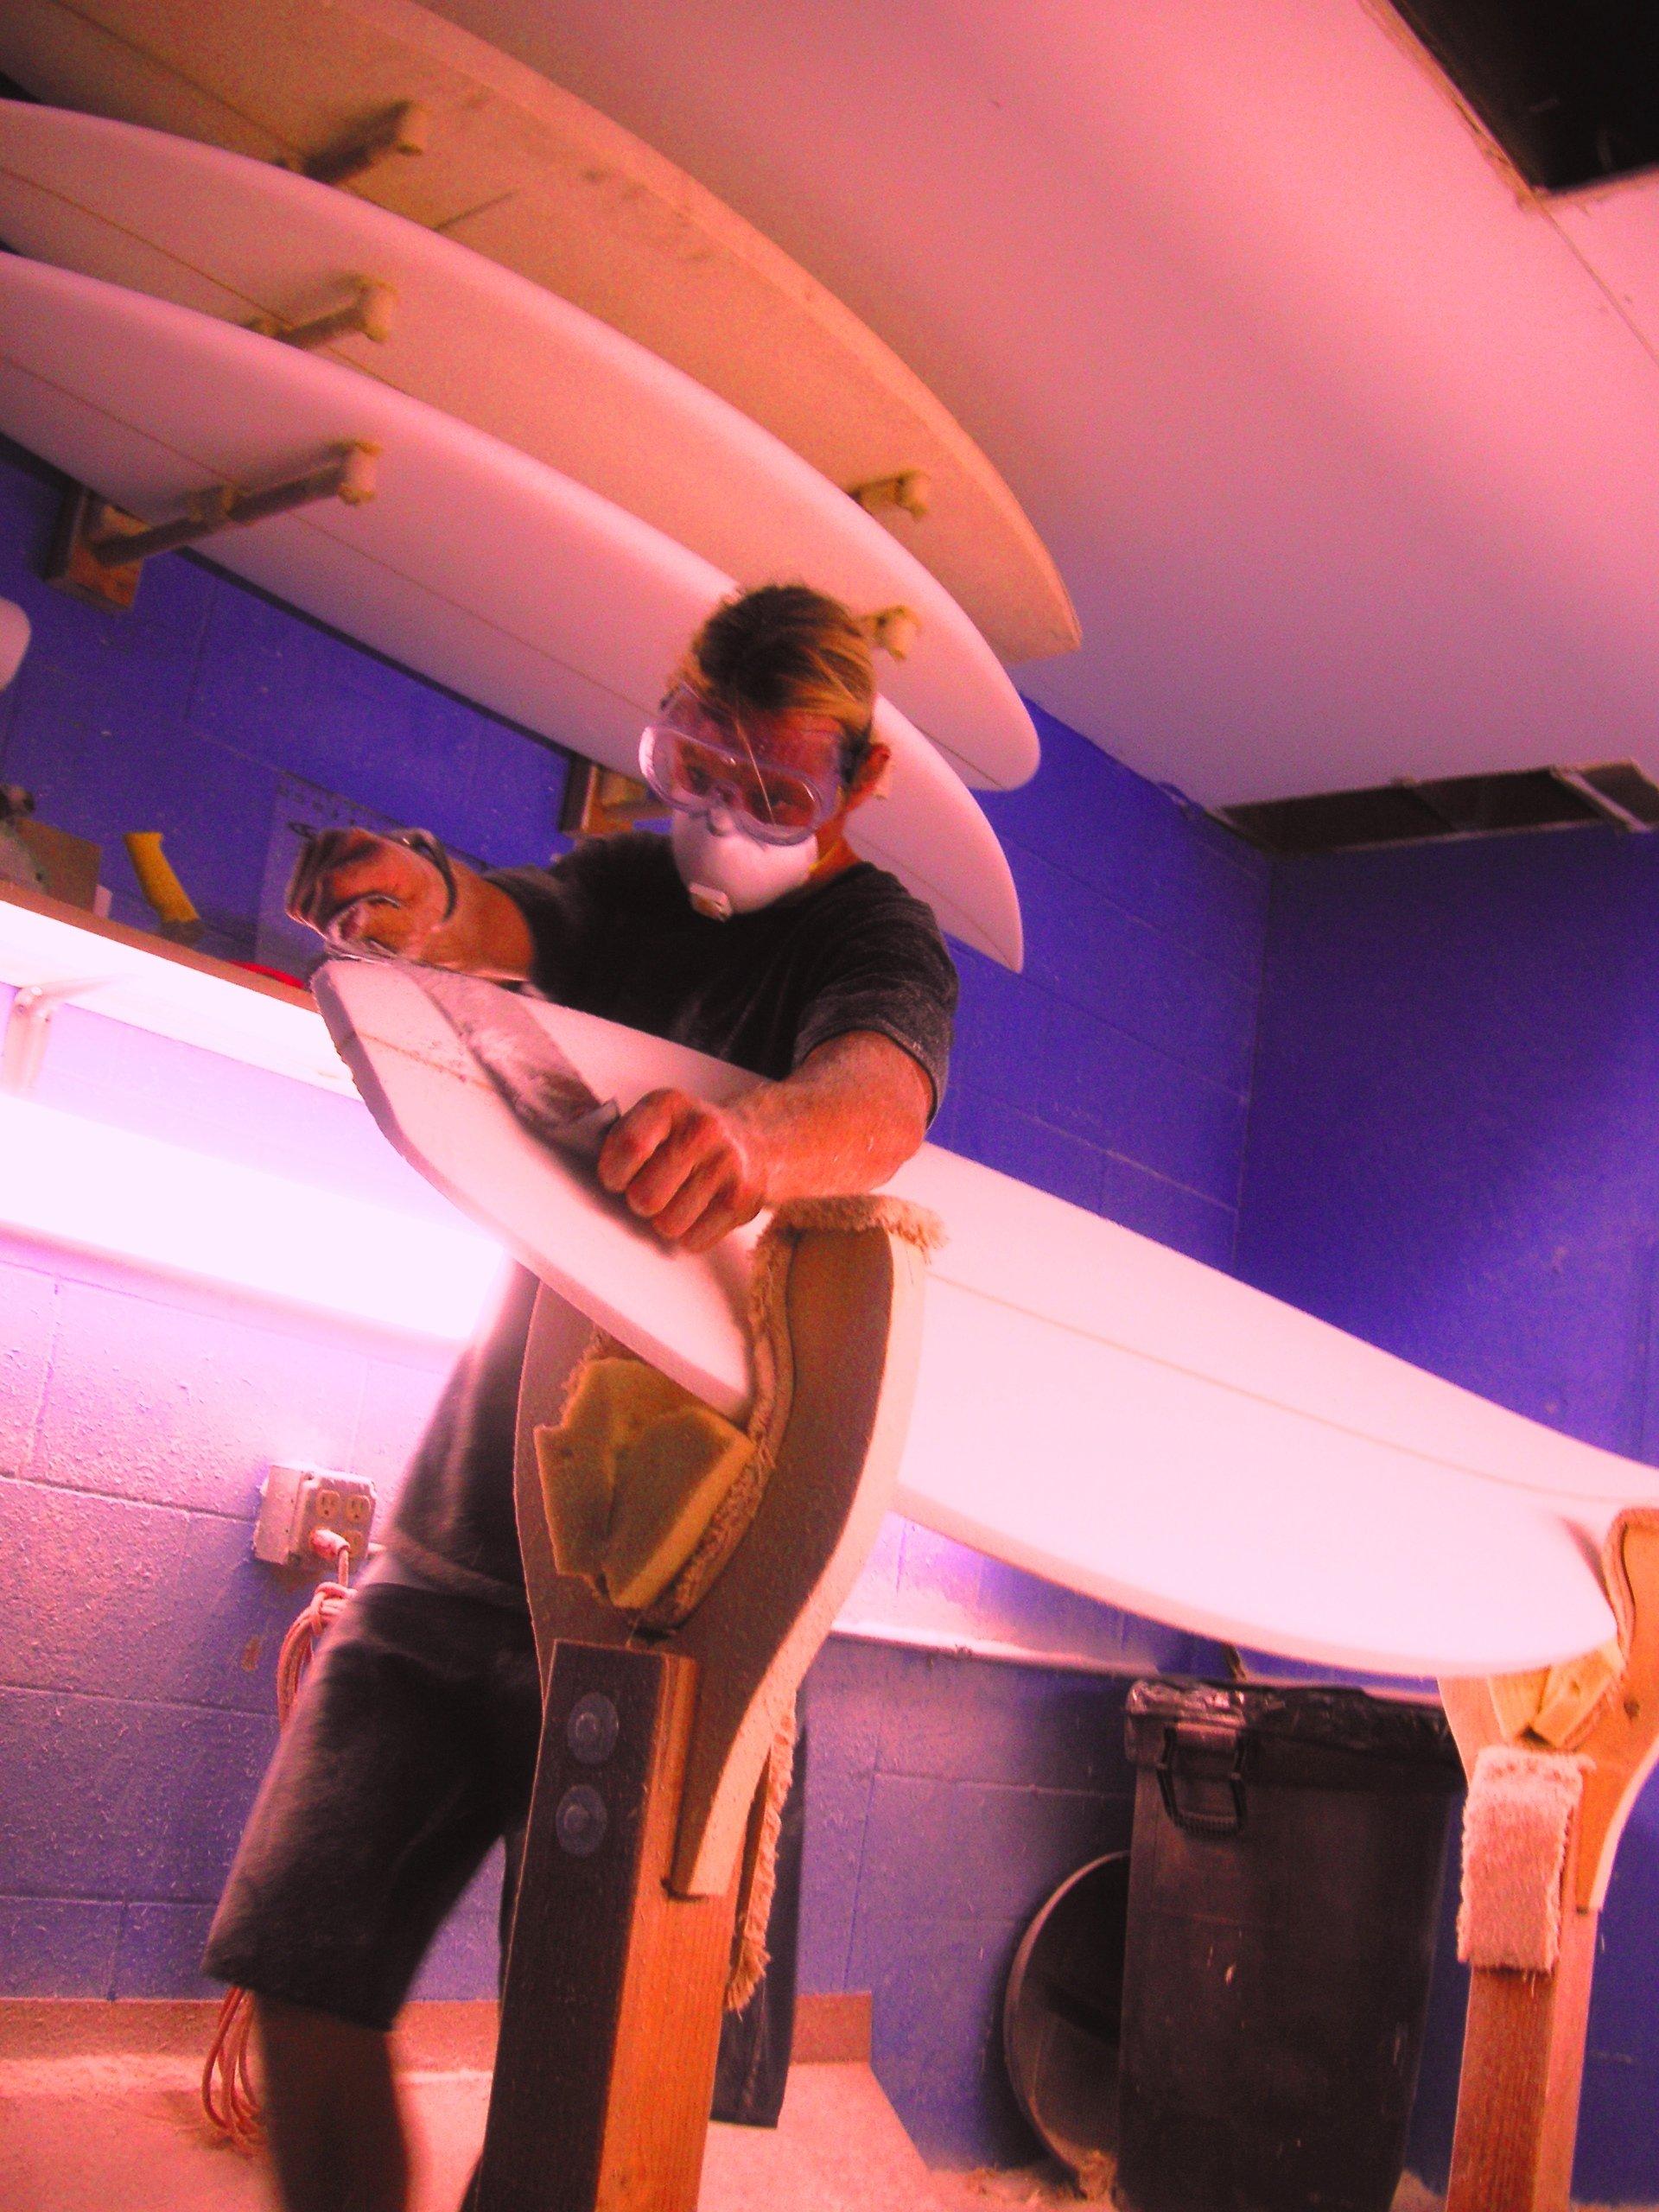 Carrozza-Surfboards-huntington-beach-local-shapers.jpg